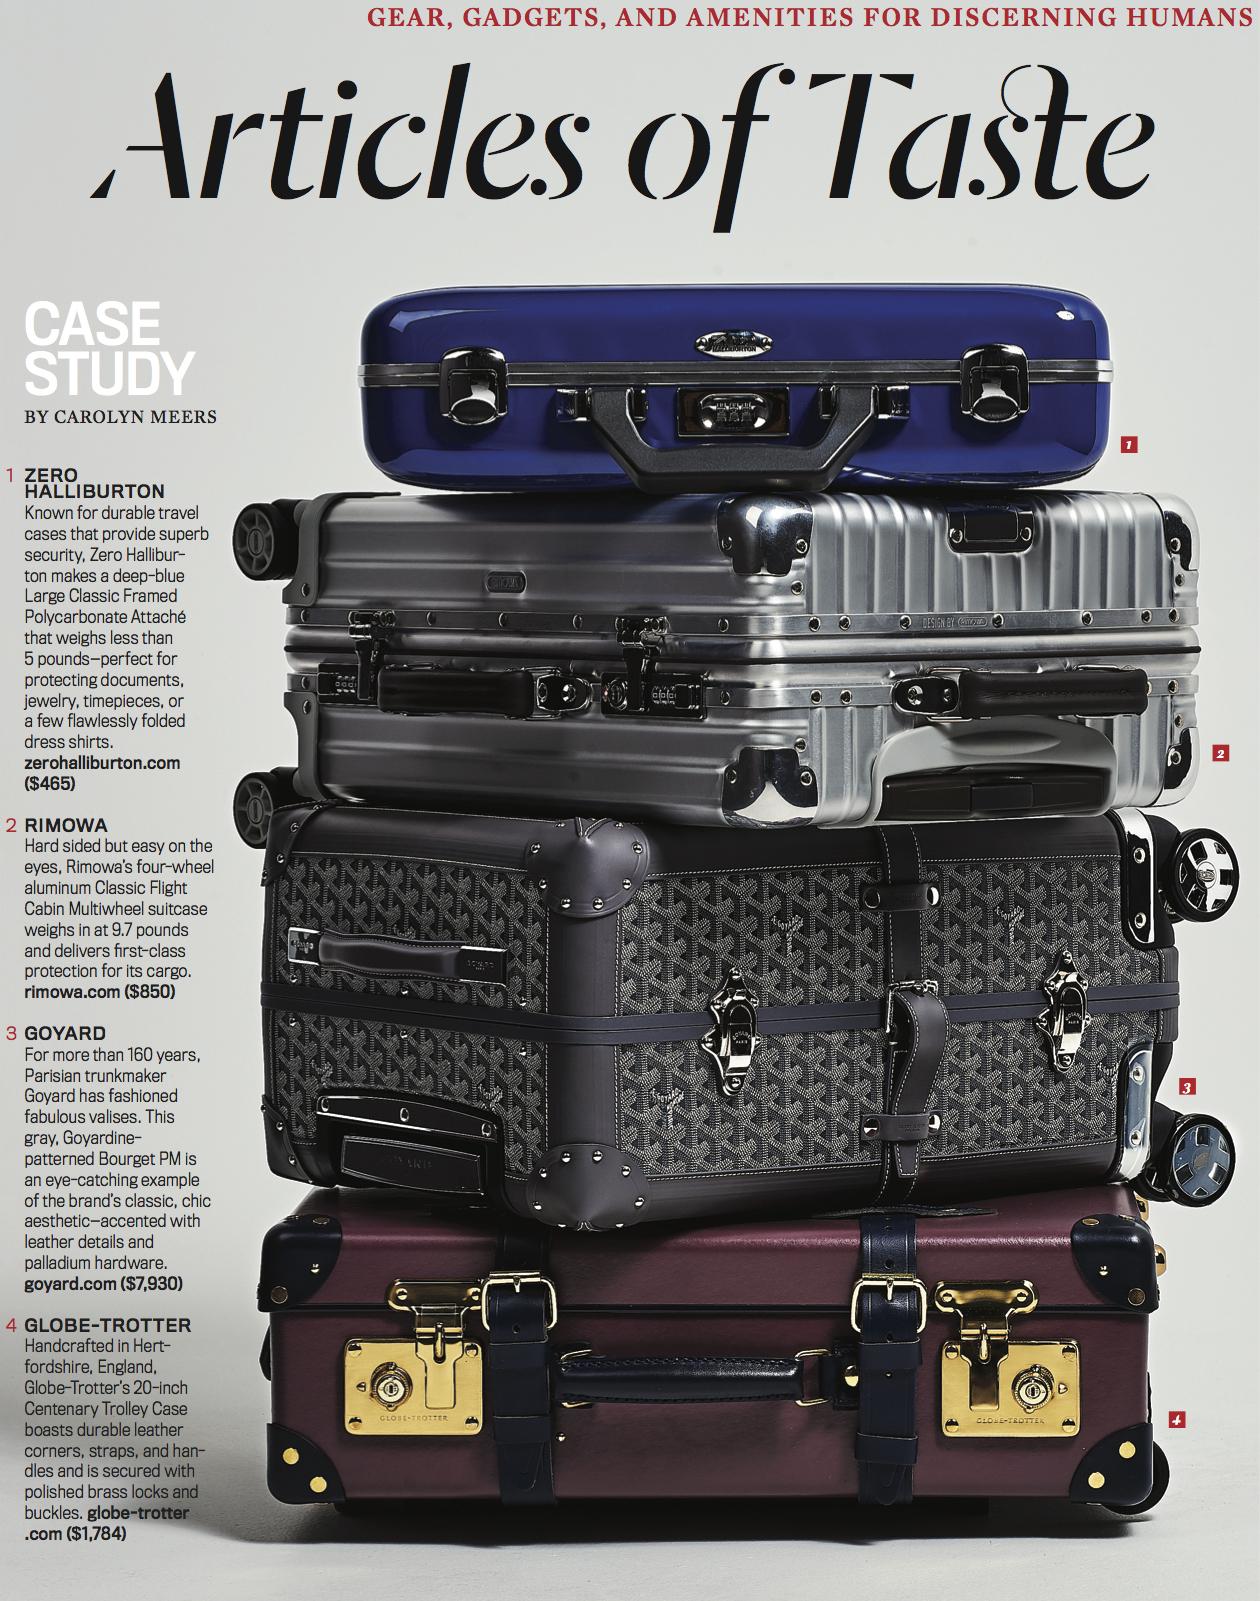 robbreport.luggage.jpg